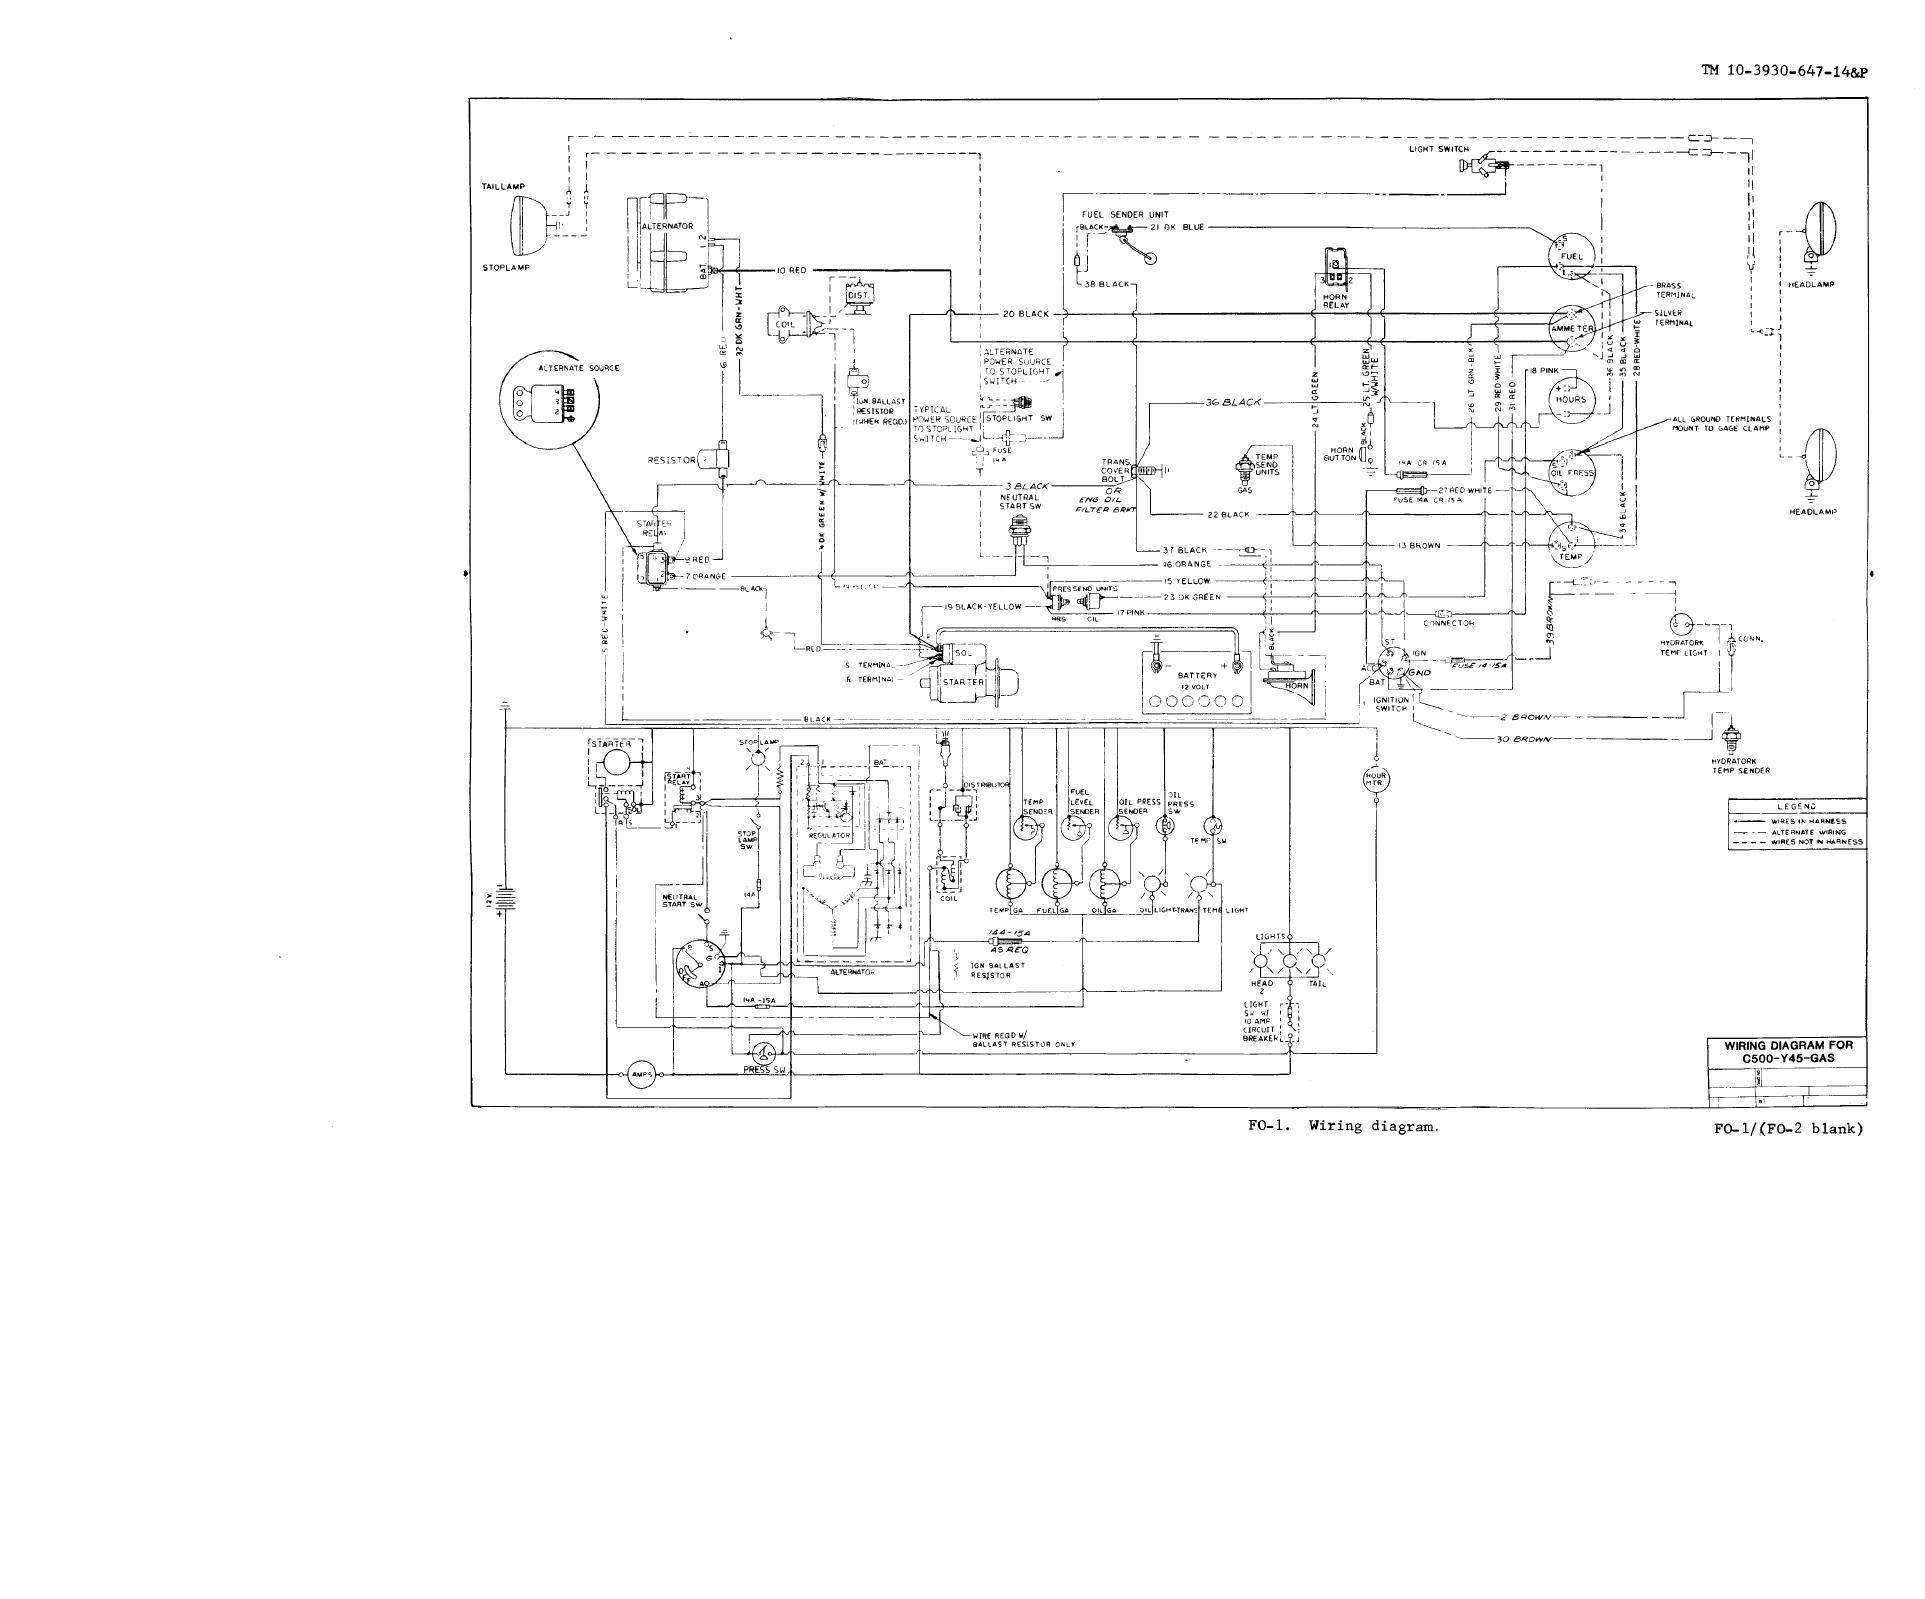 Need Wiring Diagram Clark Forklift